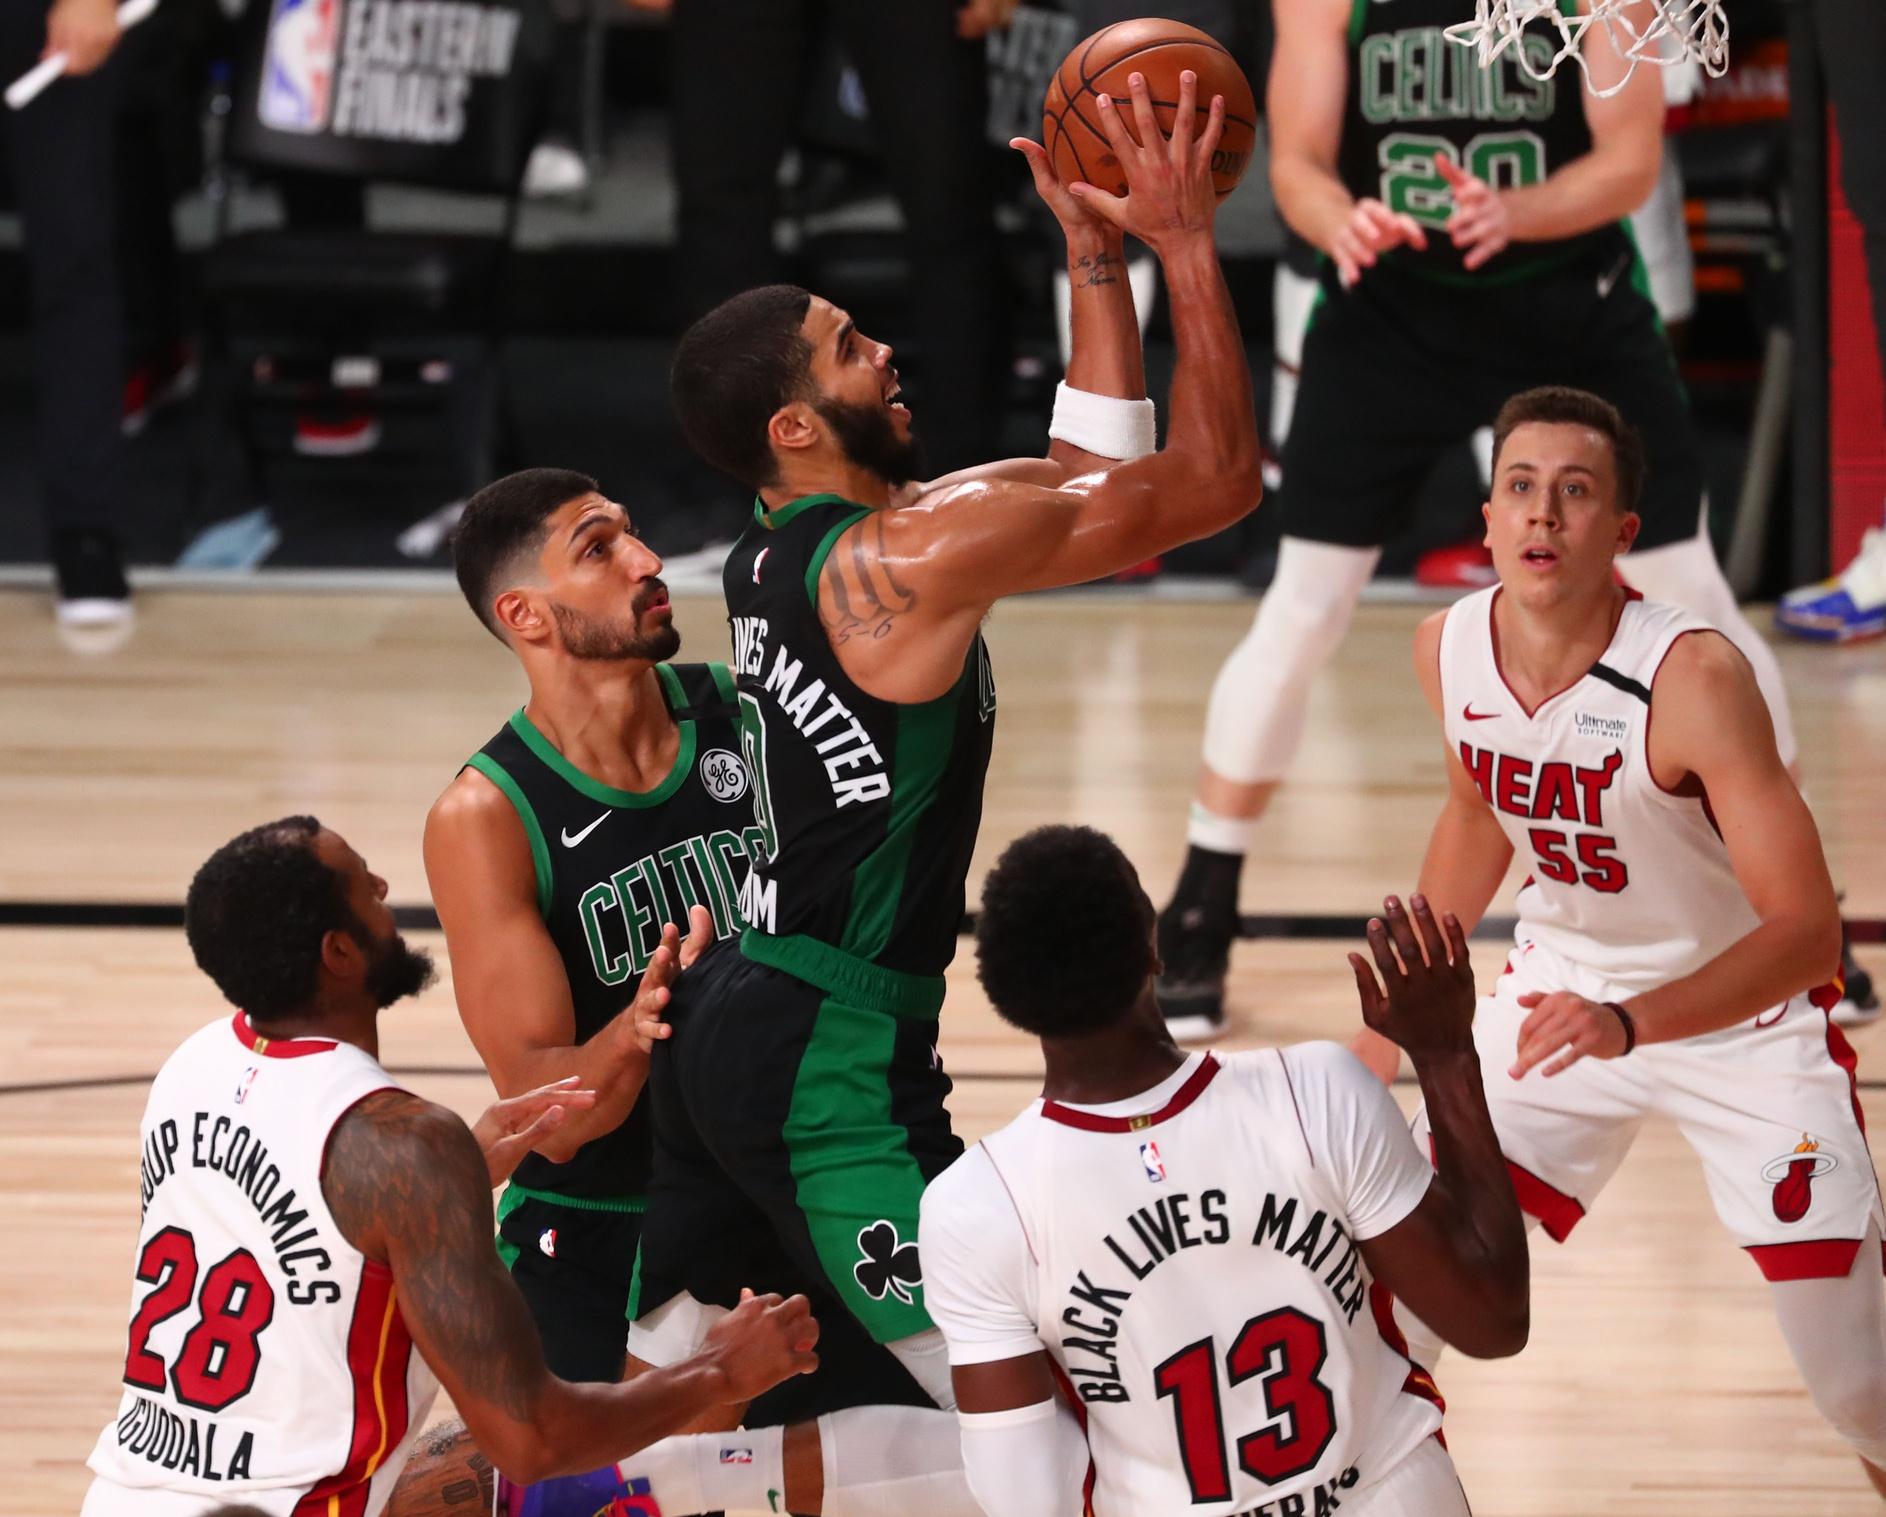 Rapid Recap: Comatose Celtics save season with epic 2nd half comeback